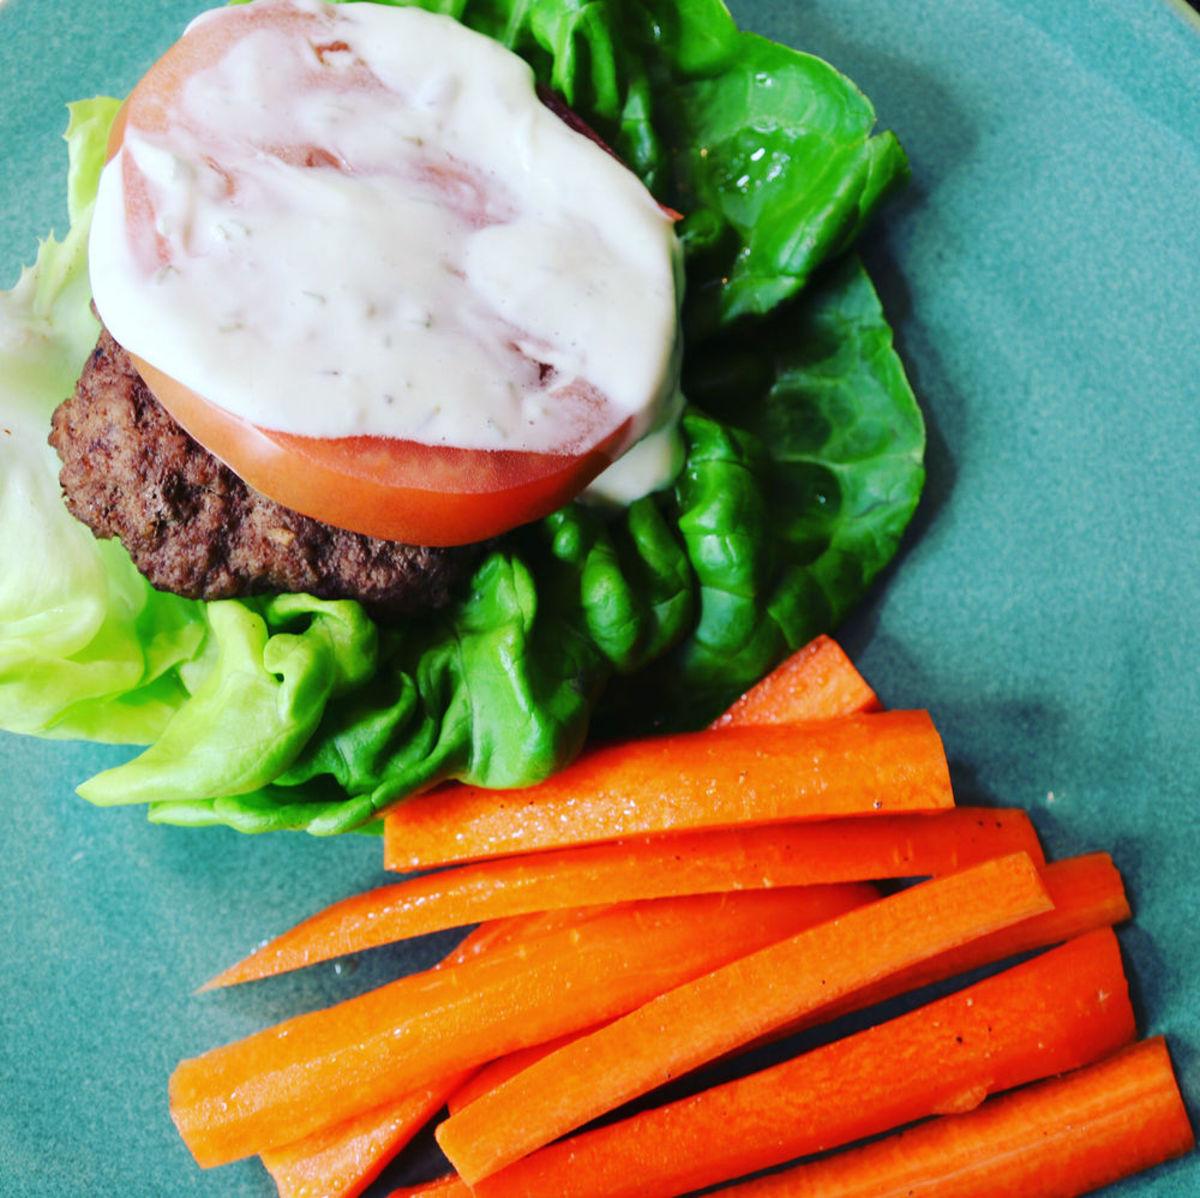 Keto-Friendly Rosemary Mayo Lettuce-Wrapped Burgers